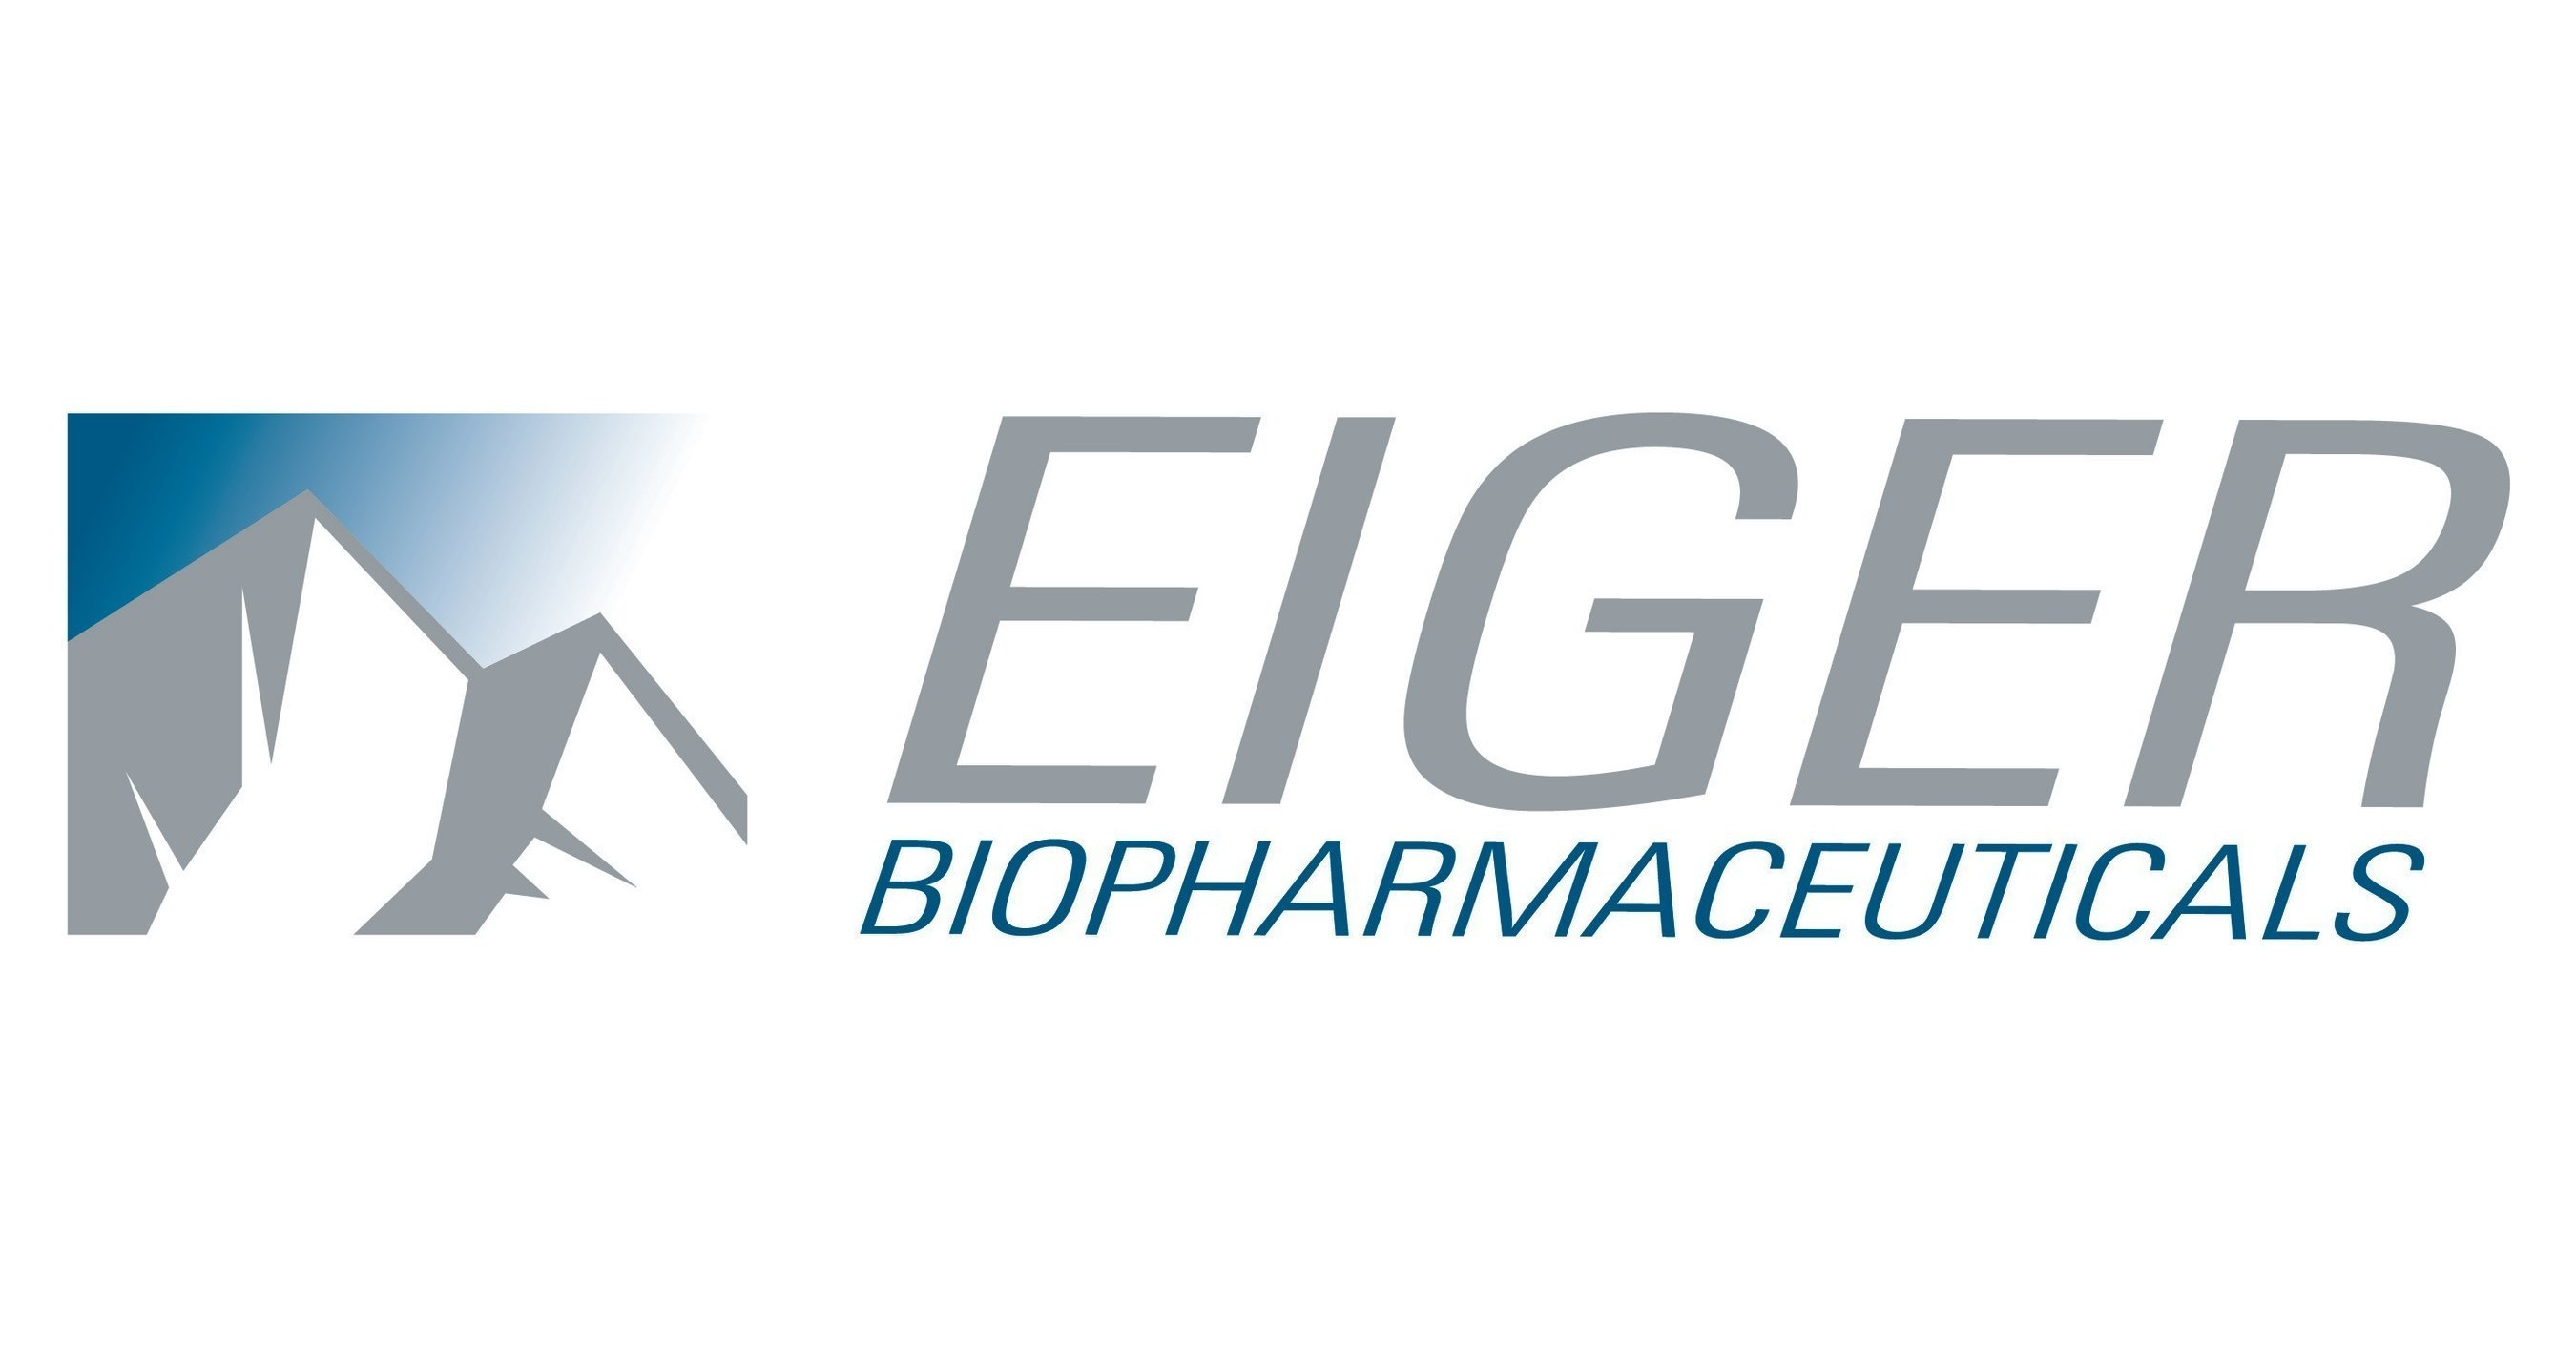 eiger biopharmaceuticals logo jpg?p=facebook.'